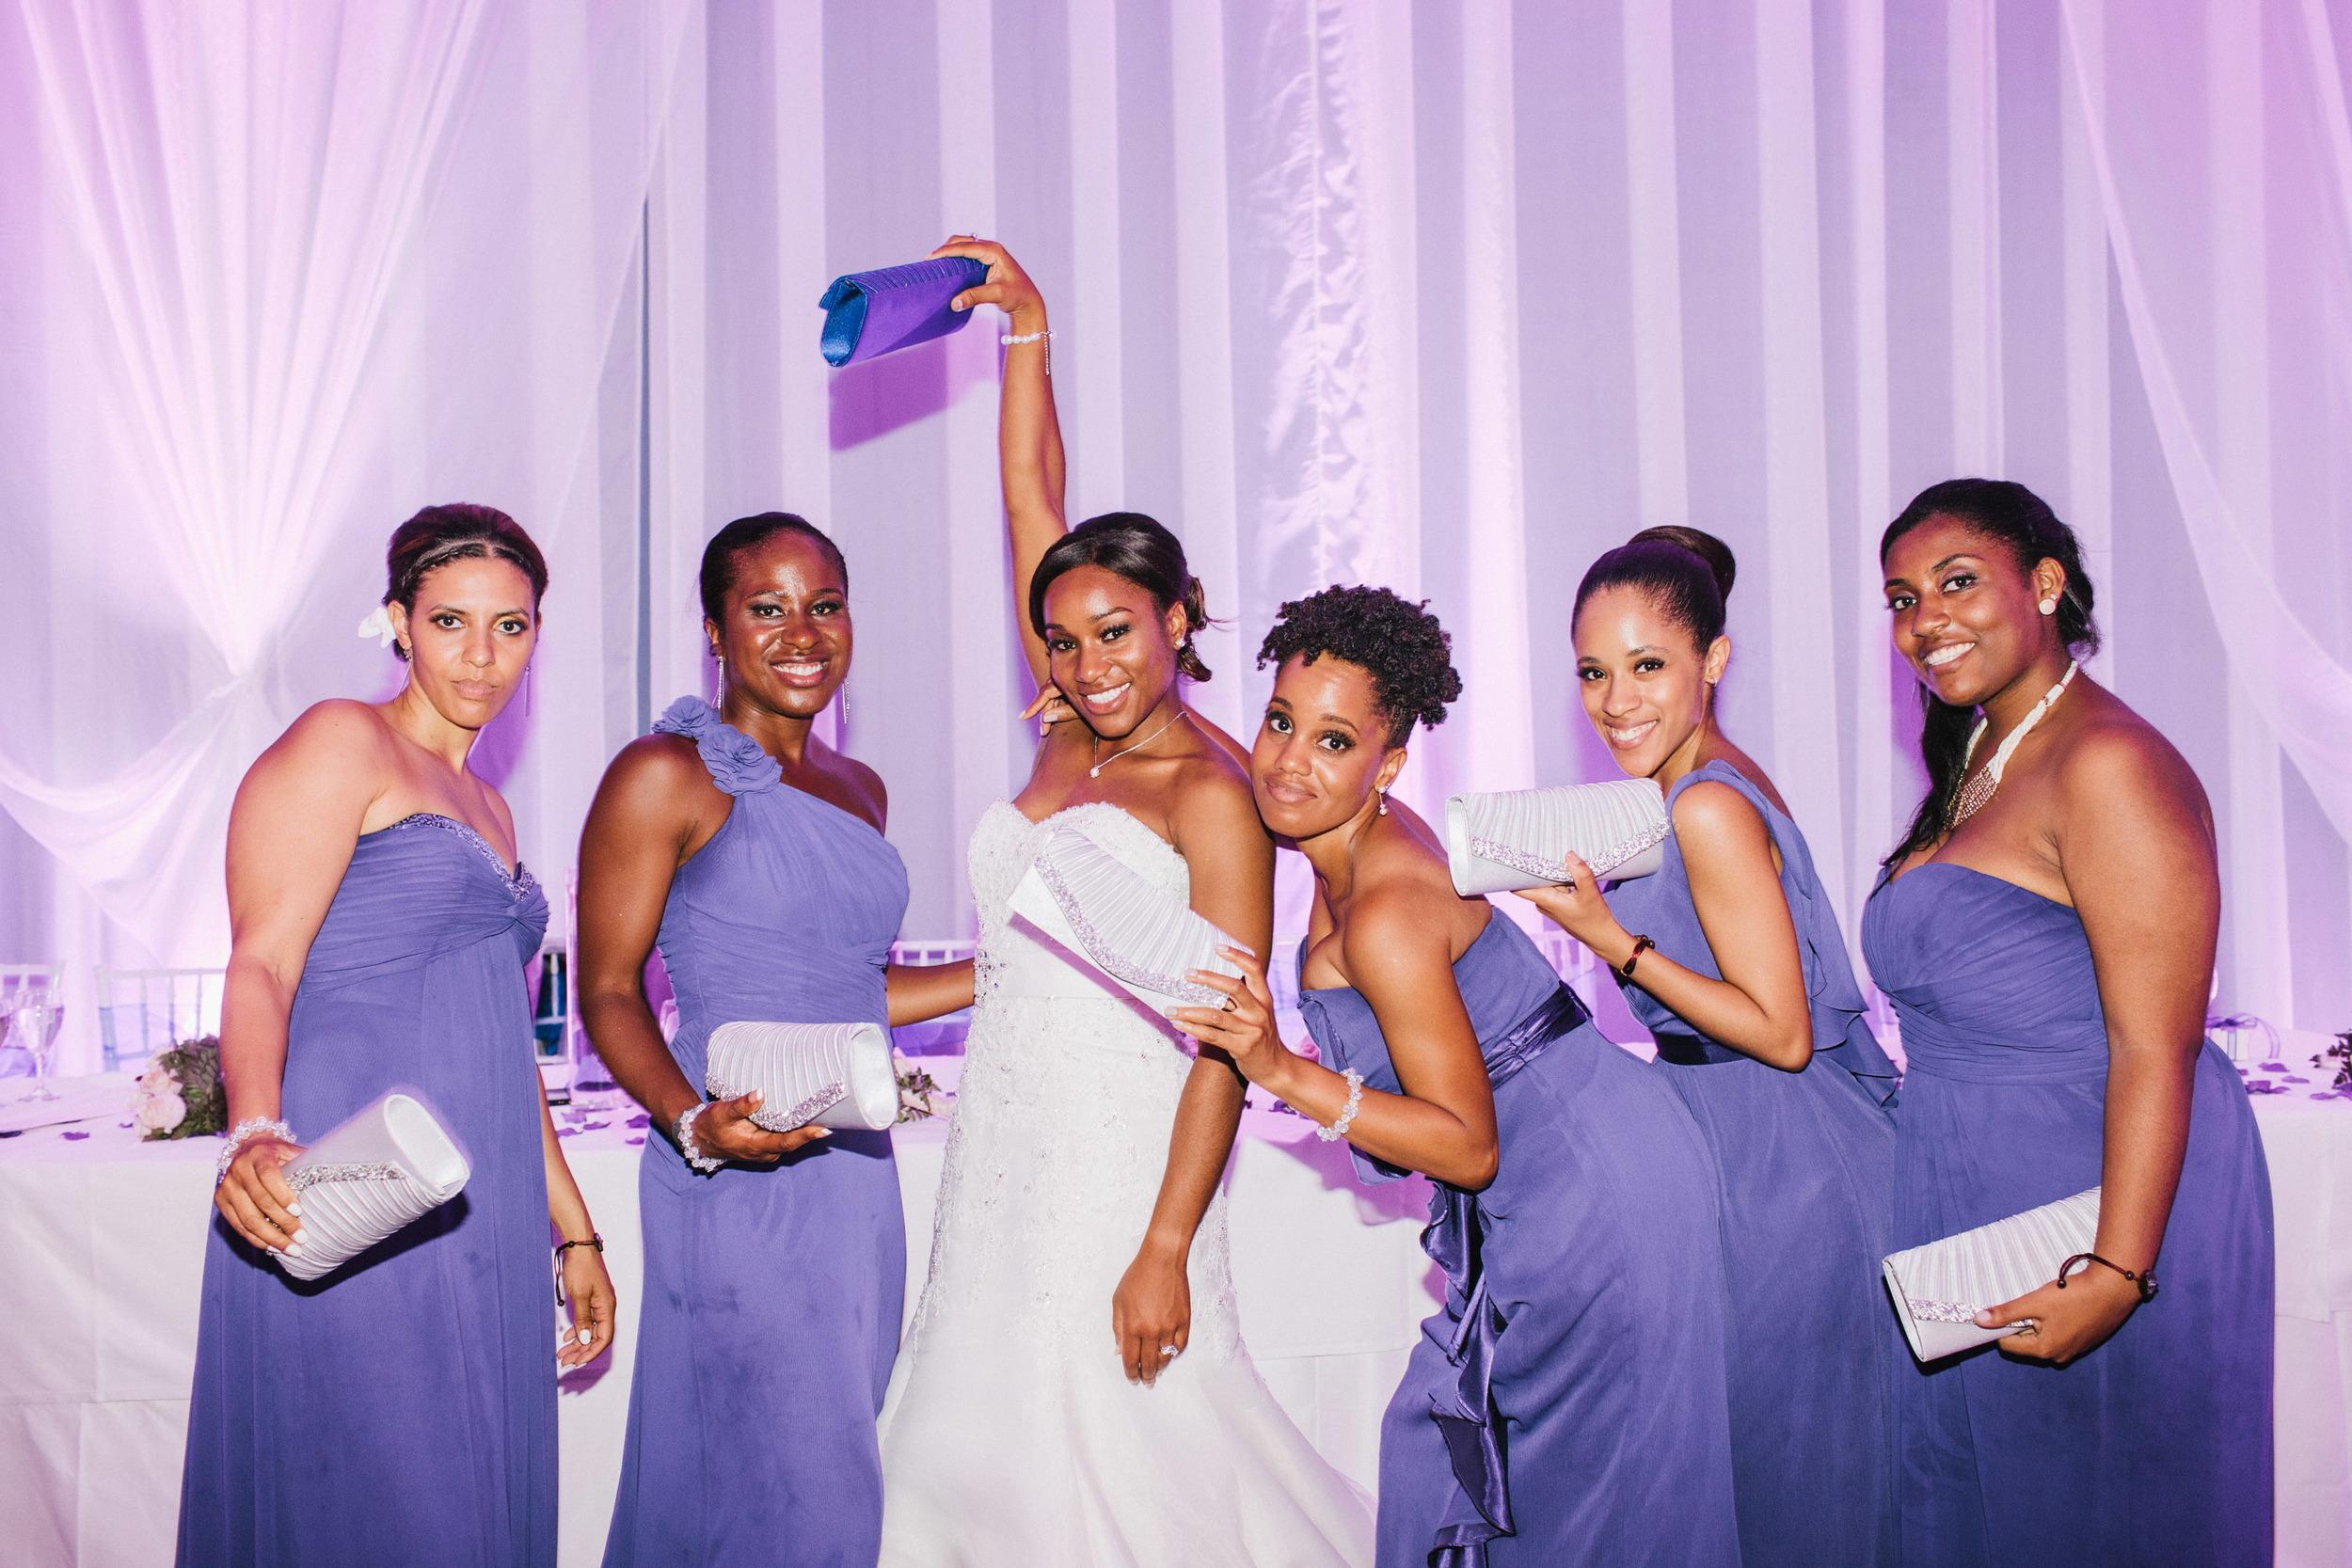 michael-rousseau-photography-dominican-republic-destination-wedding-cara-jason-colonial-majestic-dominican-republic123.jpg